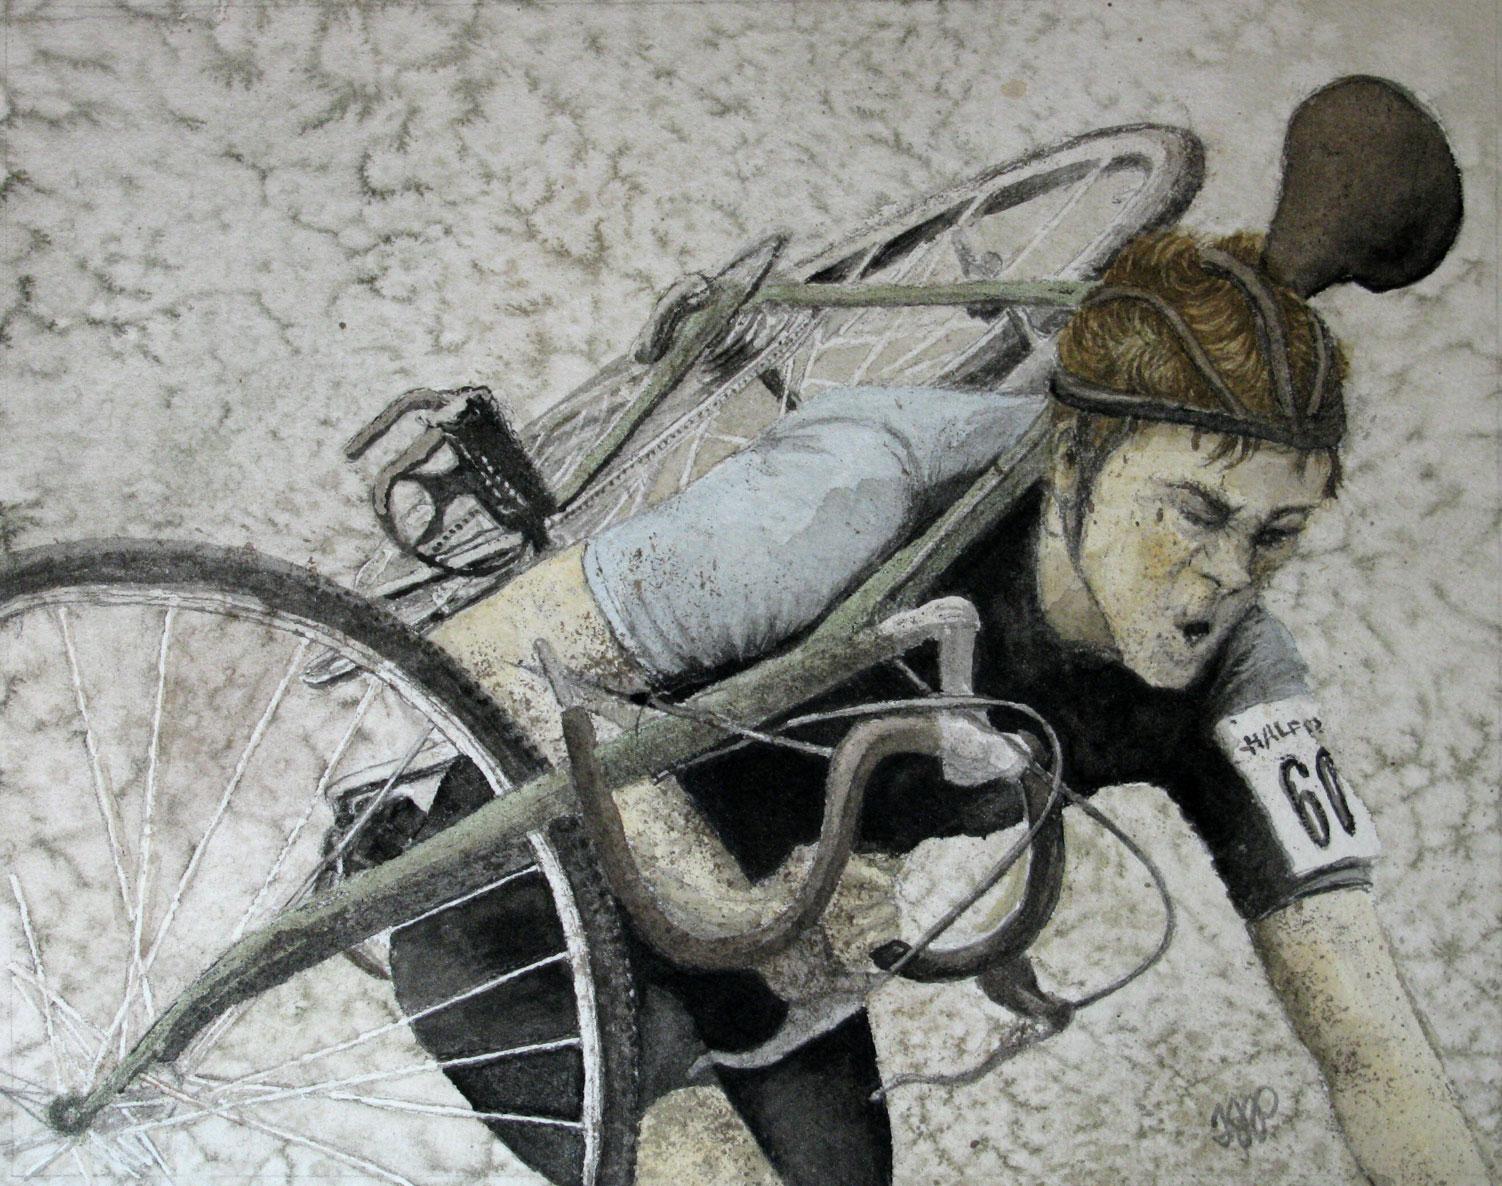 Carrying Bike sports art